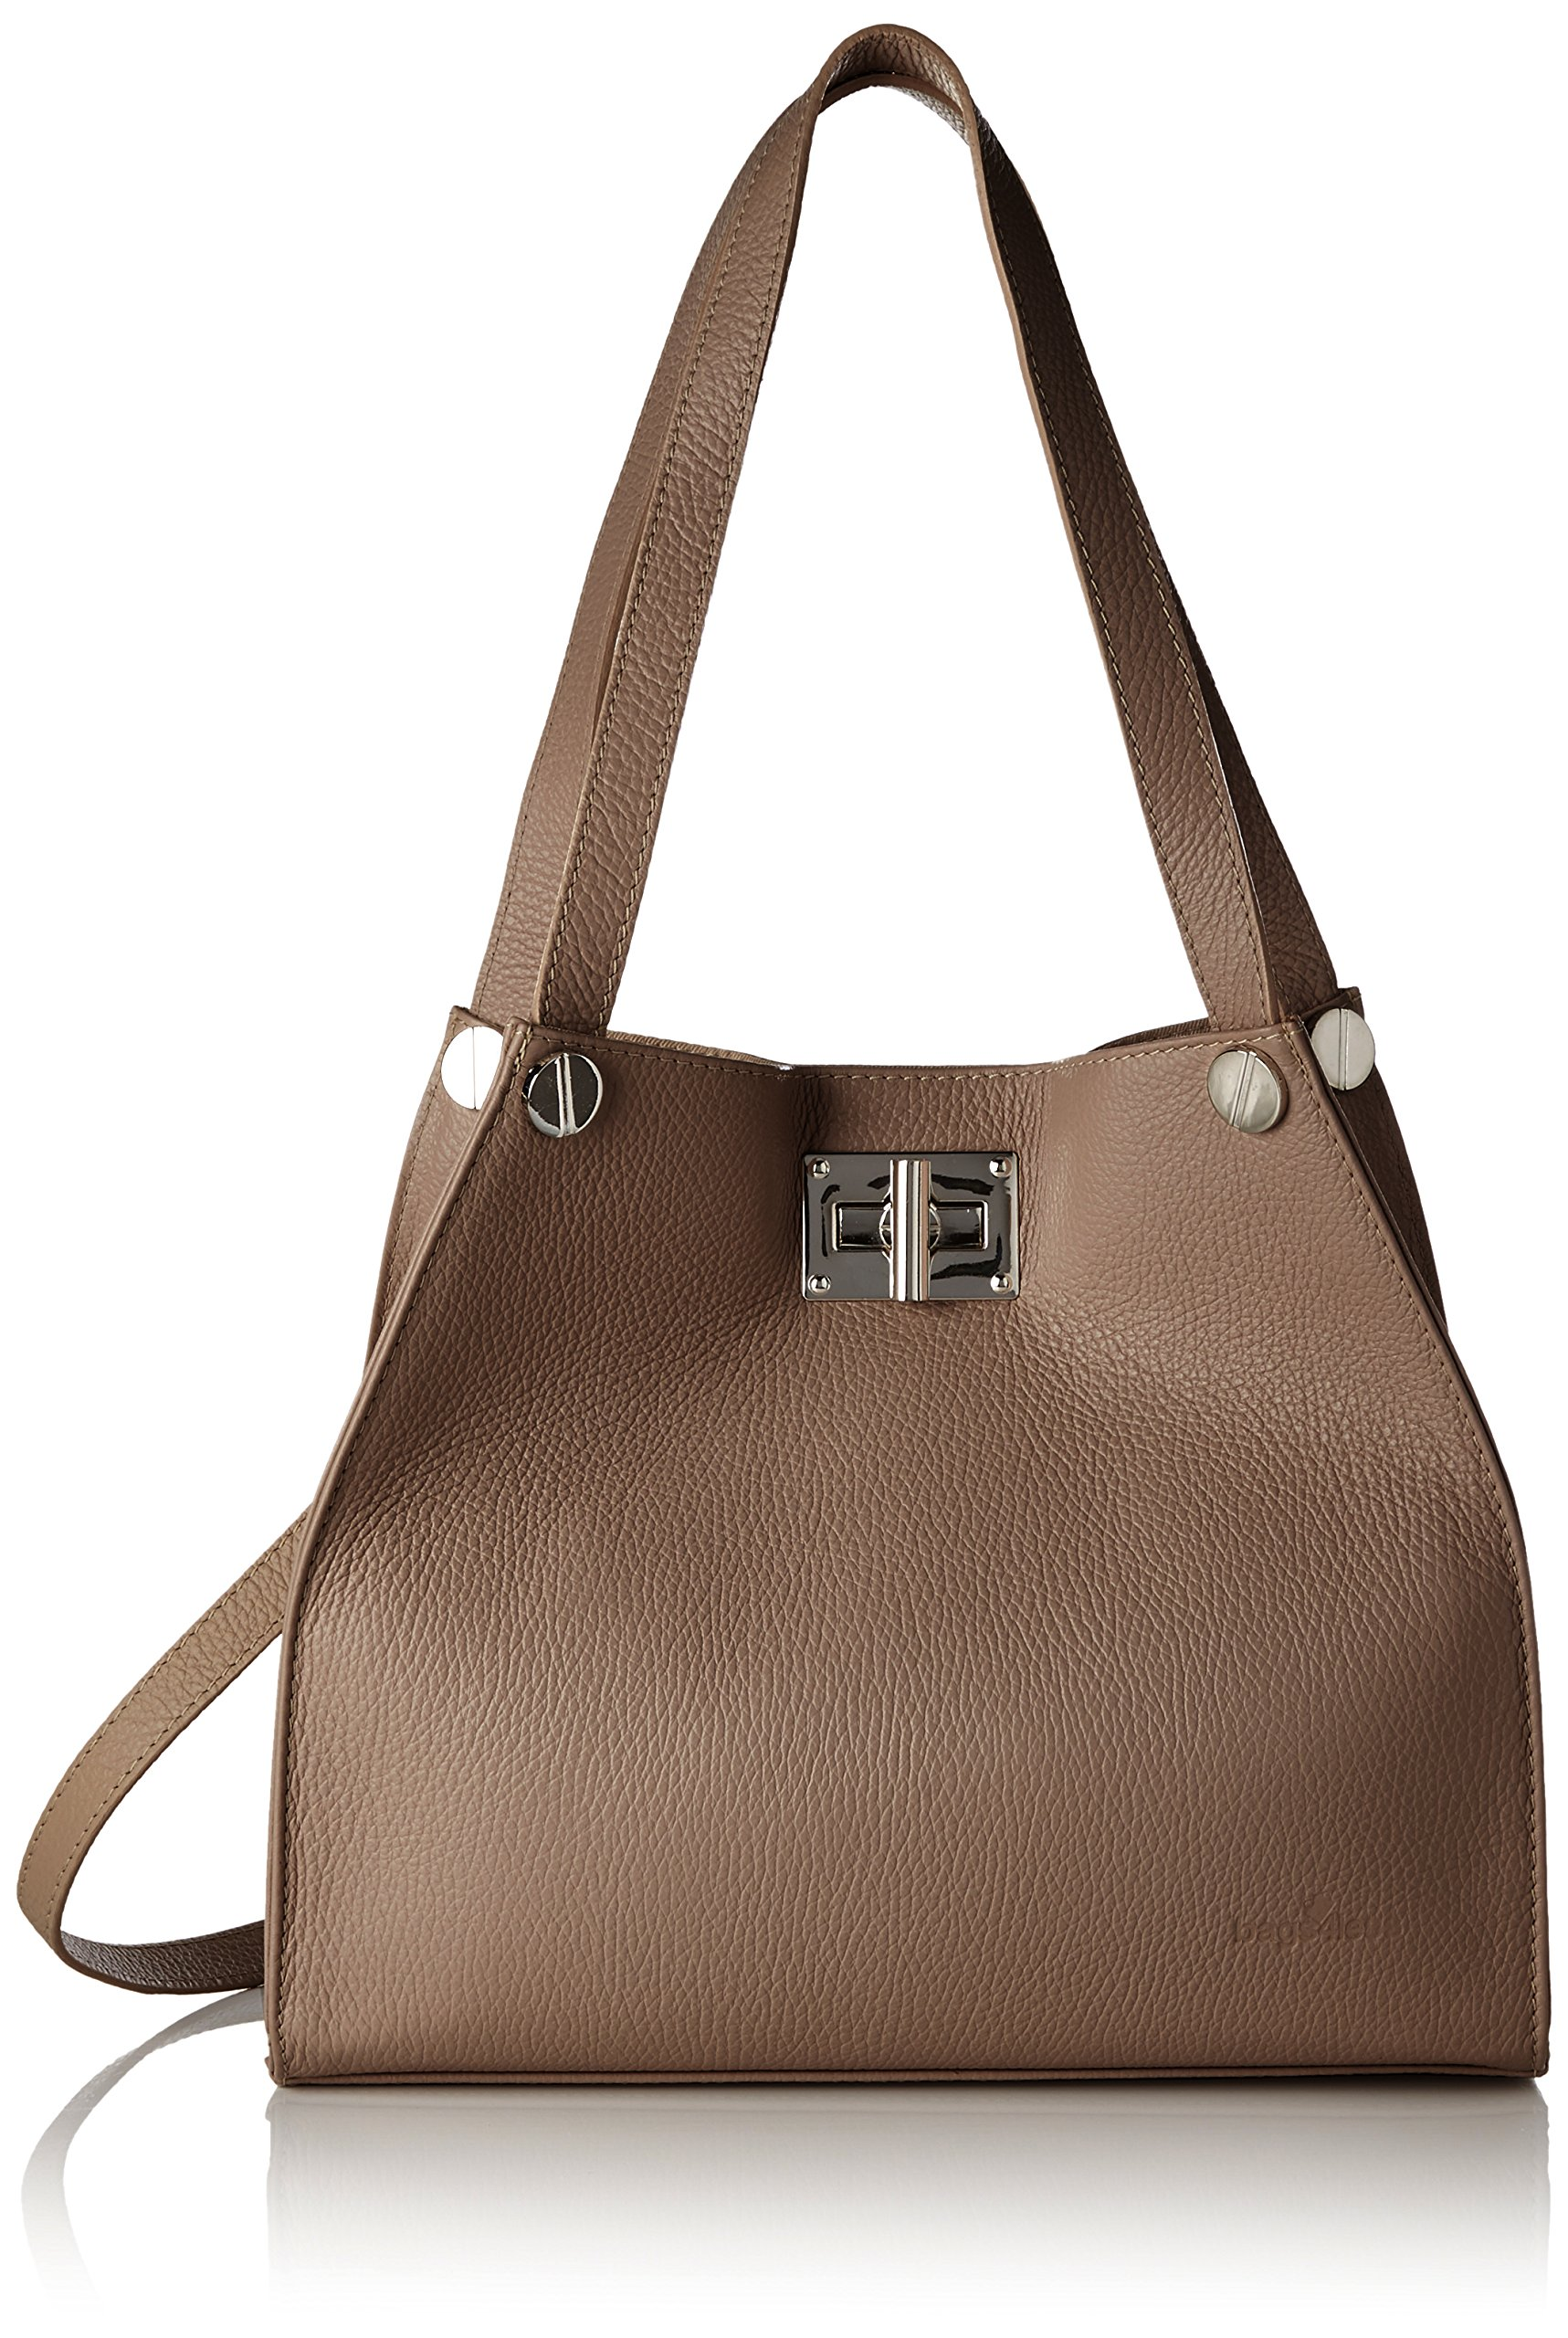 GloriaSacs X Cmb FemmeBrauntaupe11x27x31 H Portés Bags4less Épaule T ZiXuPk